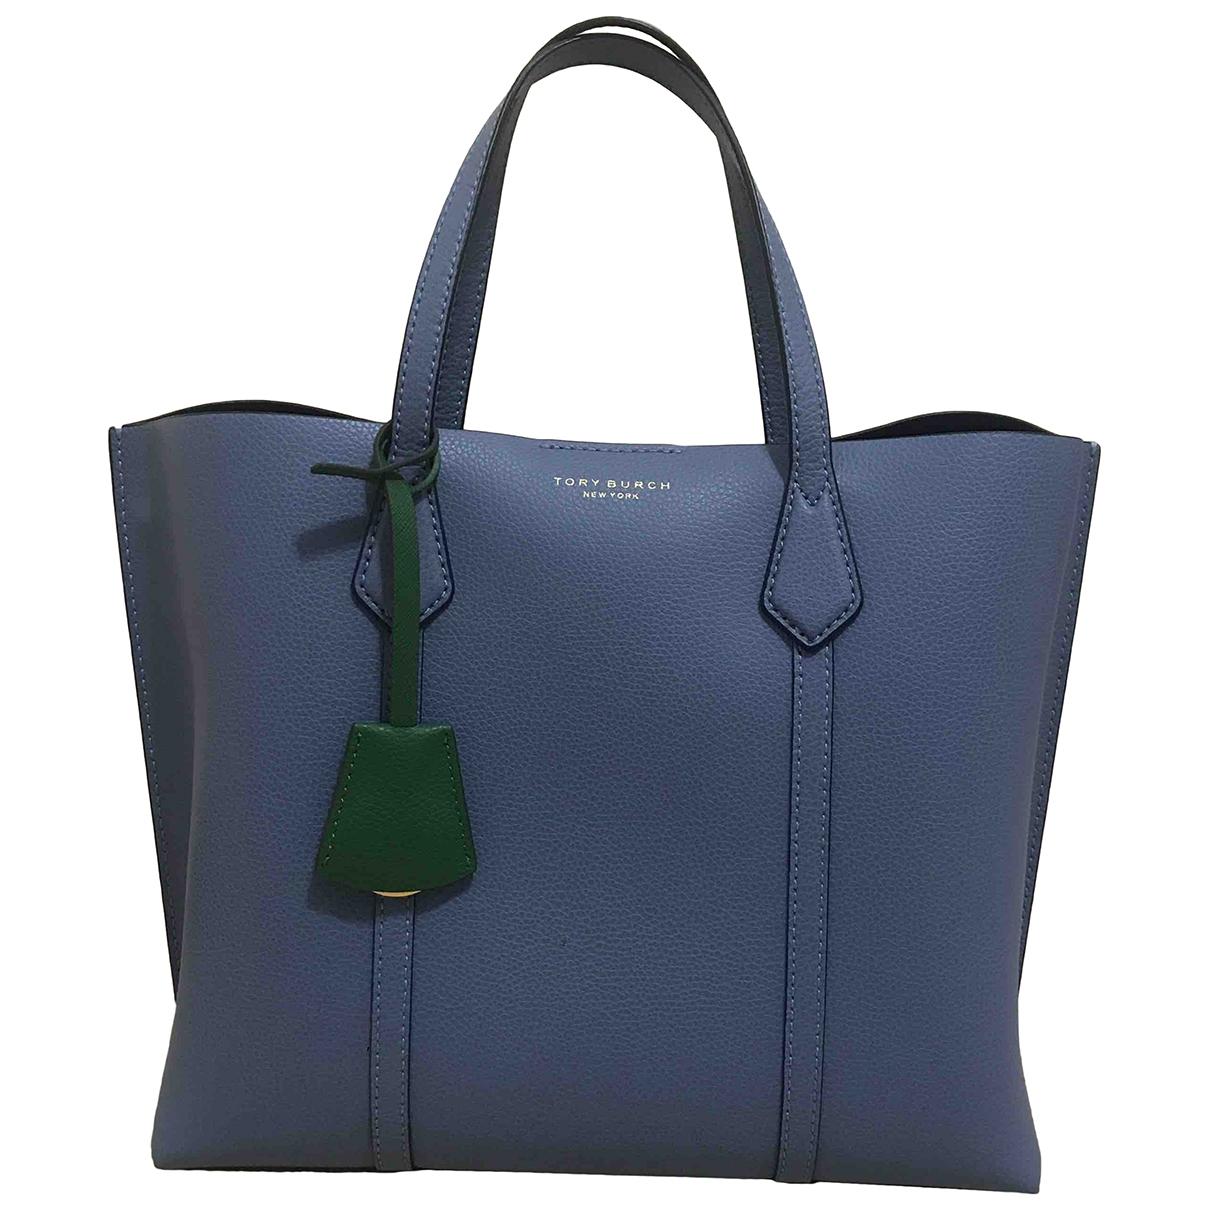 Tory Burch \N Handtasche in  Blau Leder